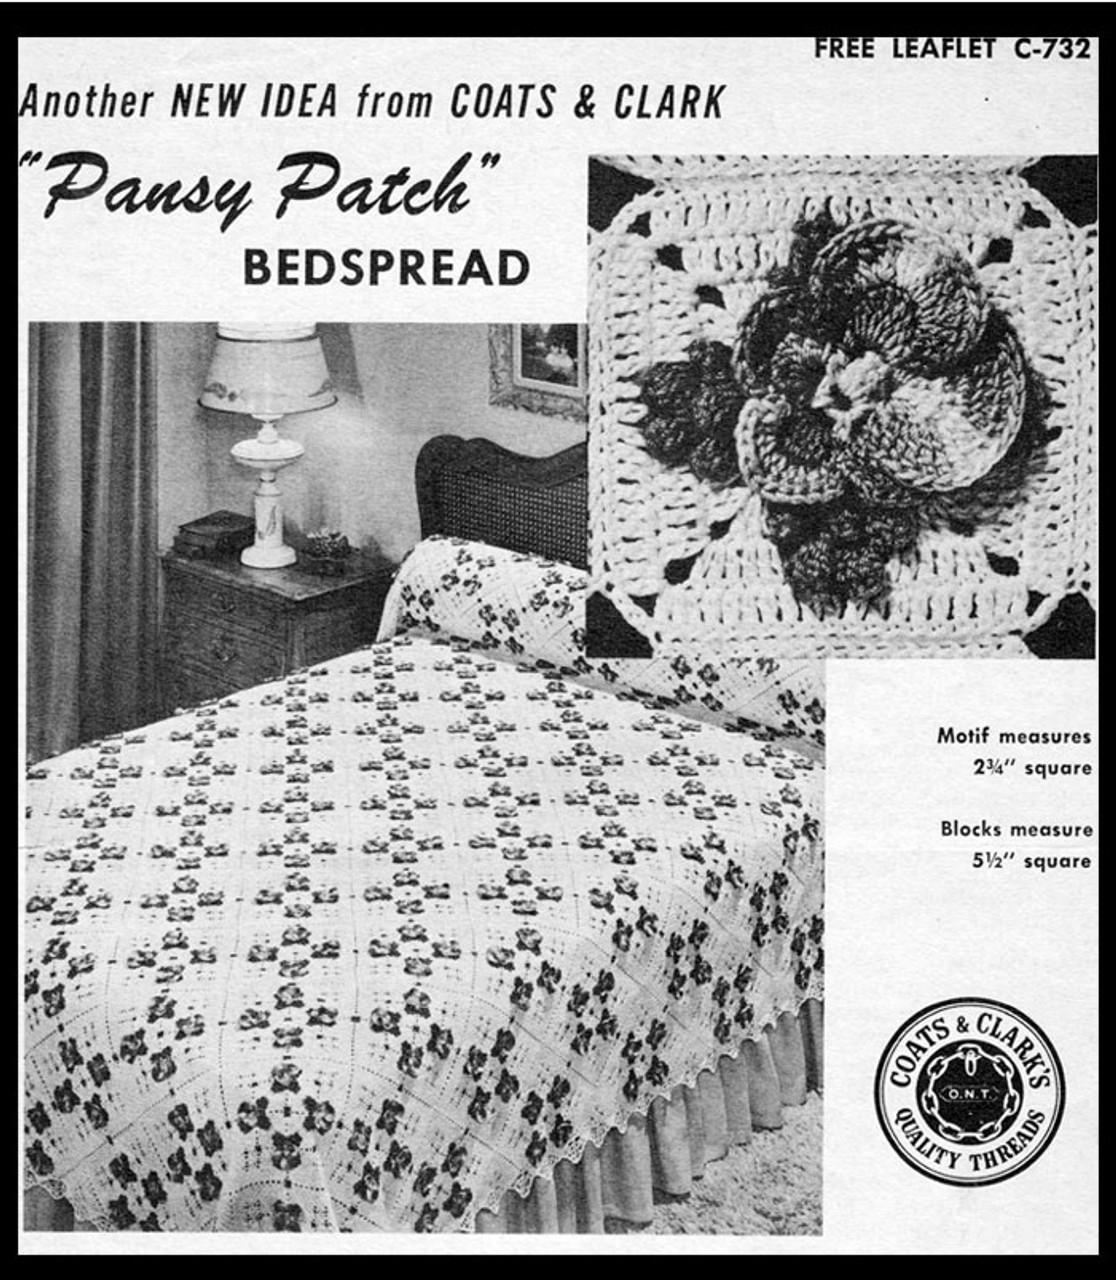 Pansy Patch Bedspread, Coats Clark Leaflet C732